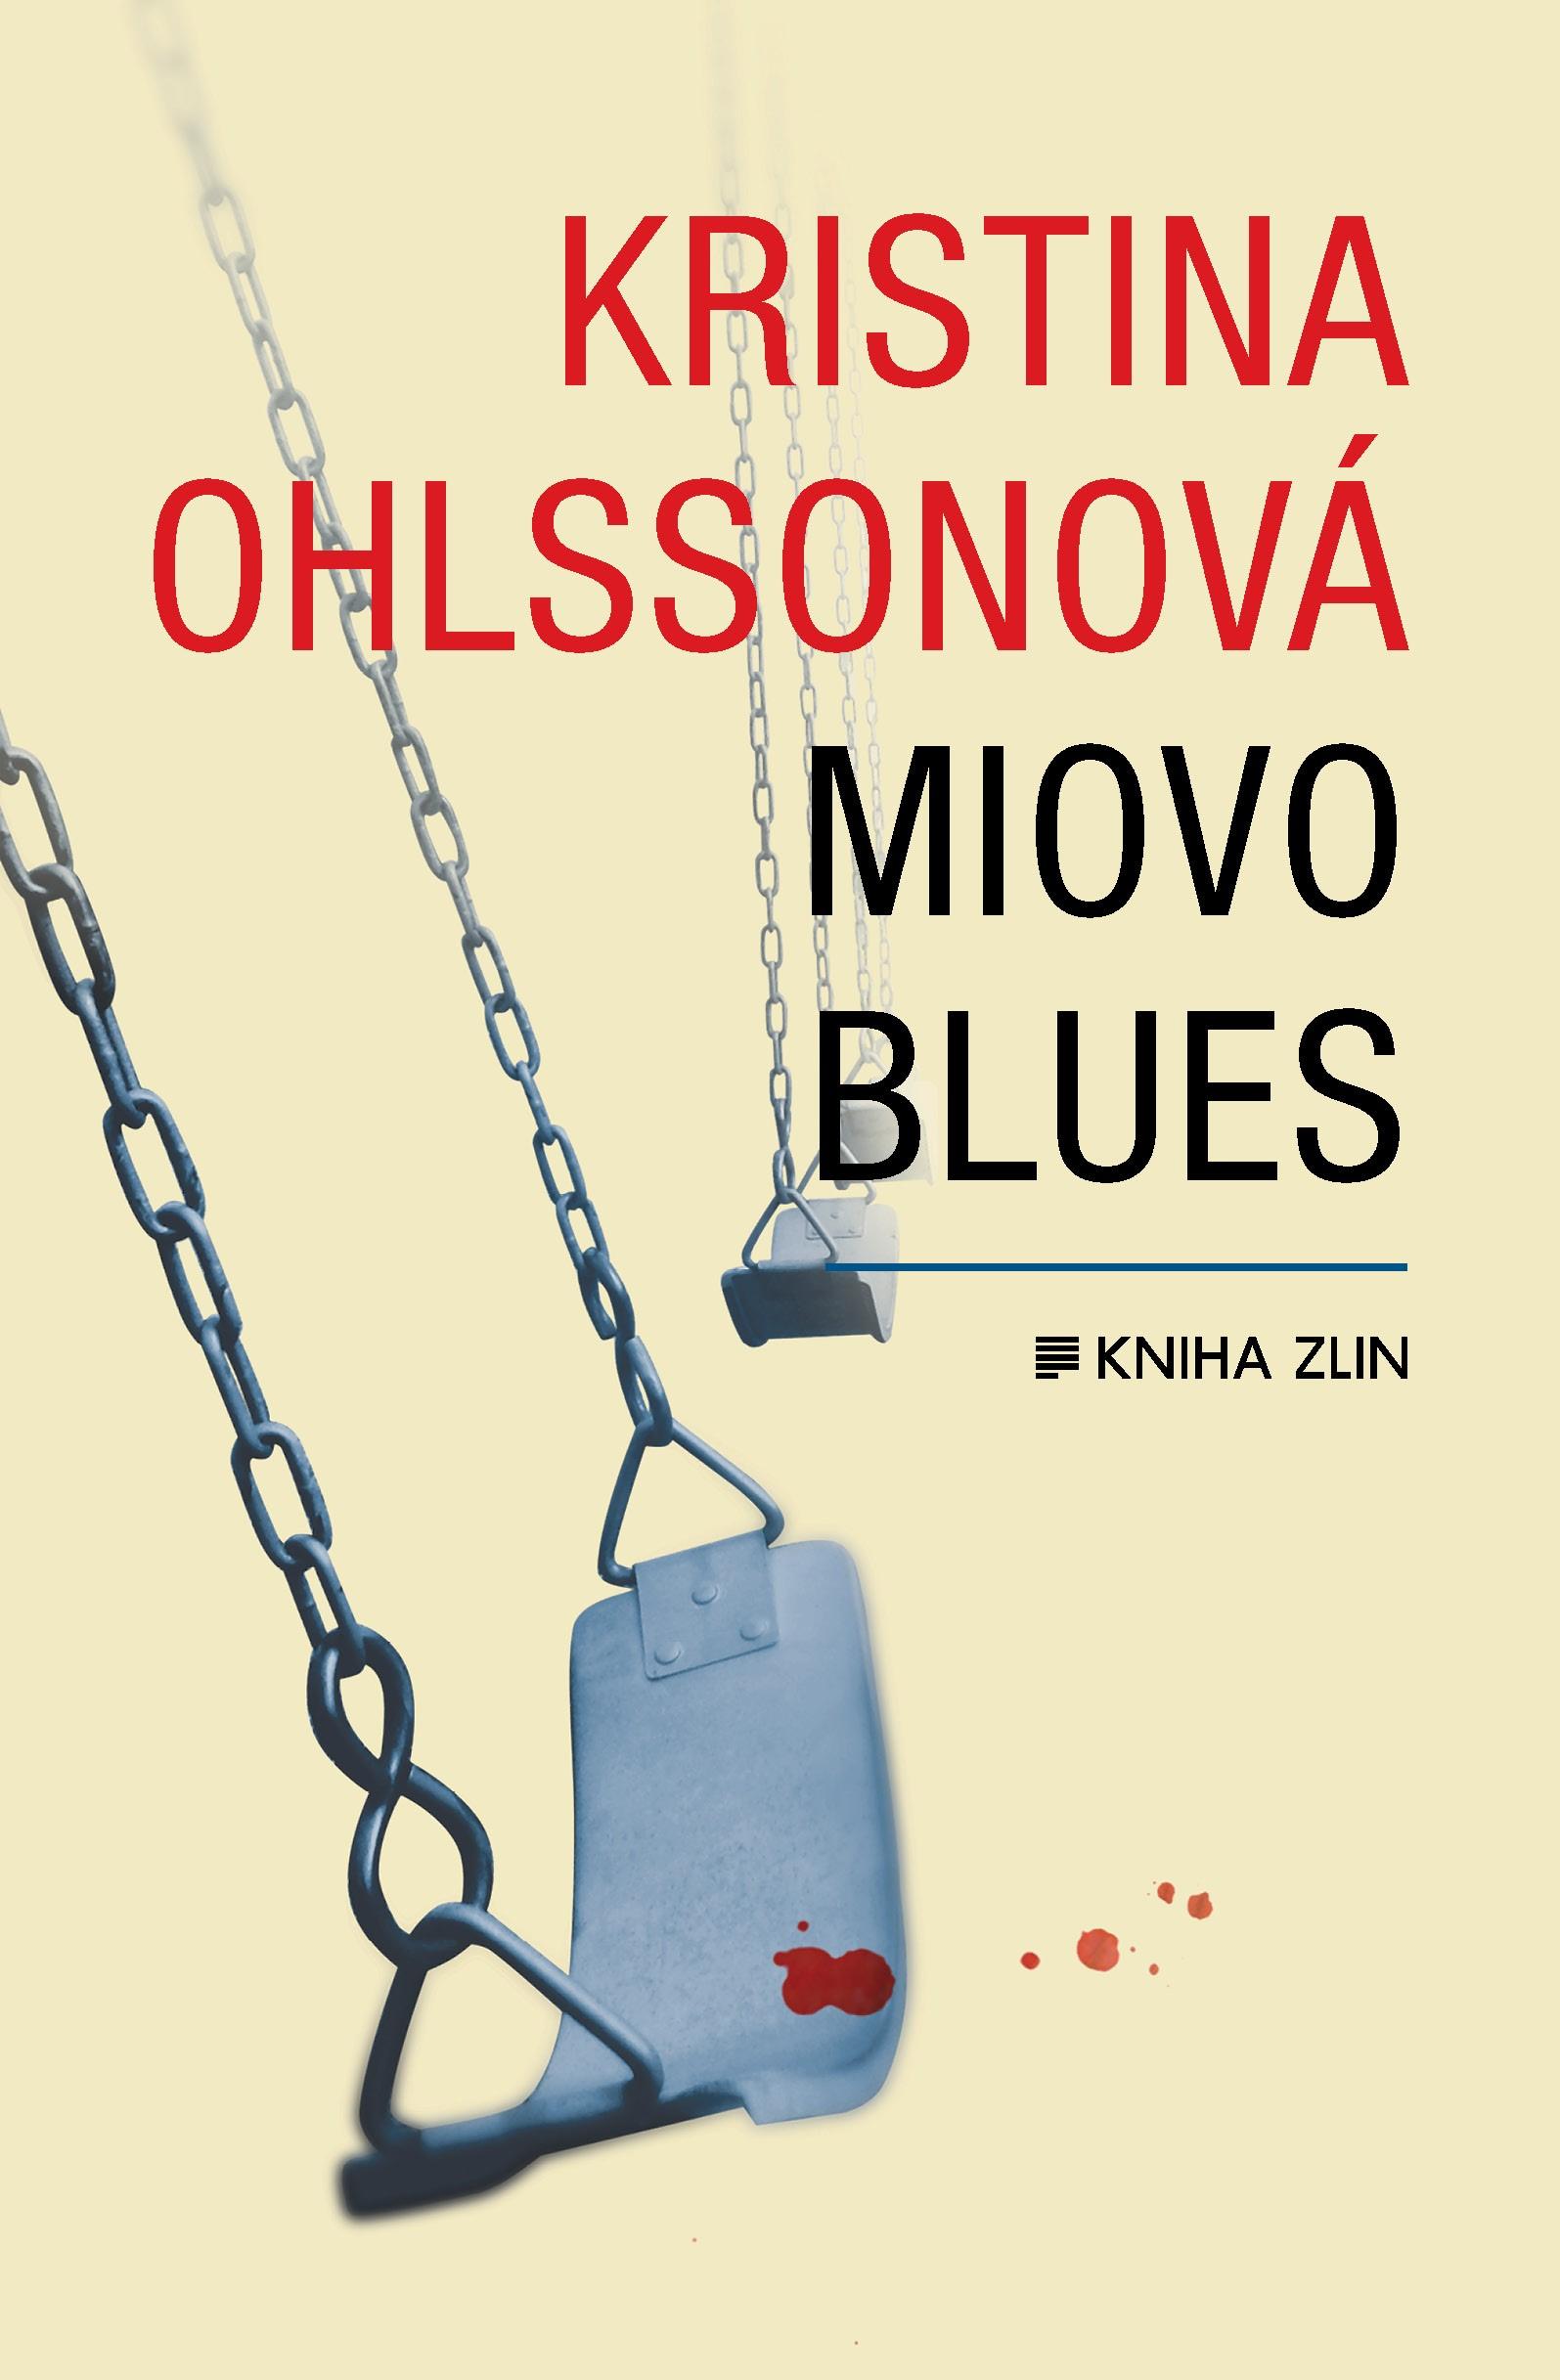 Miovo blues | Luisa Robovská, Kristina Ohlssonová